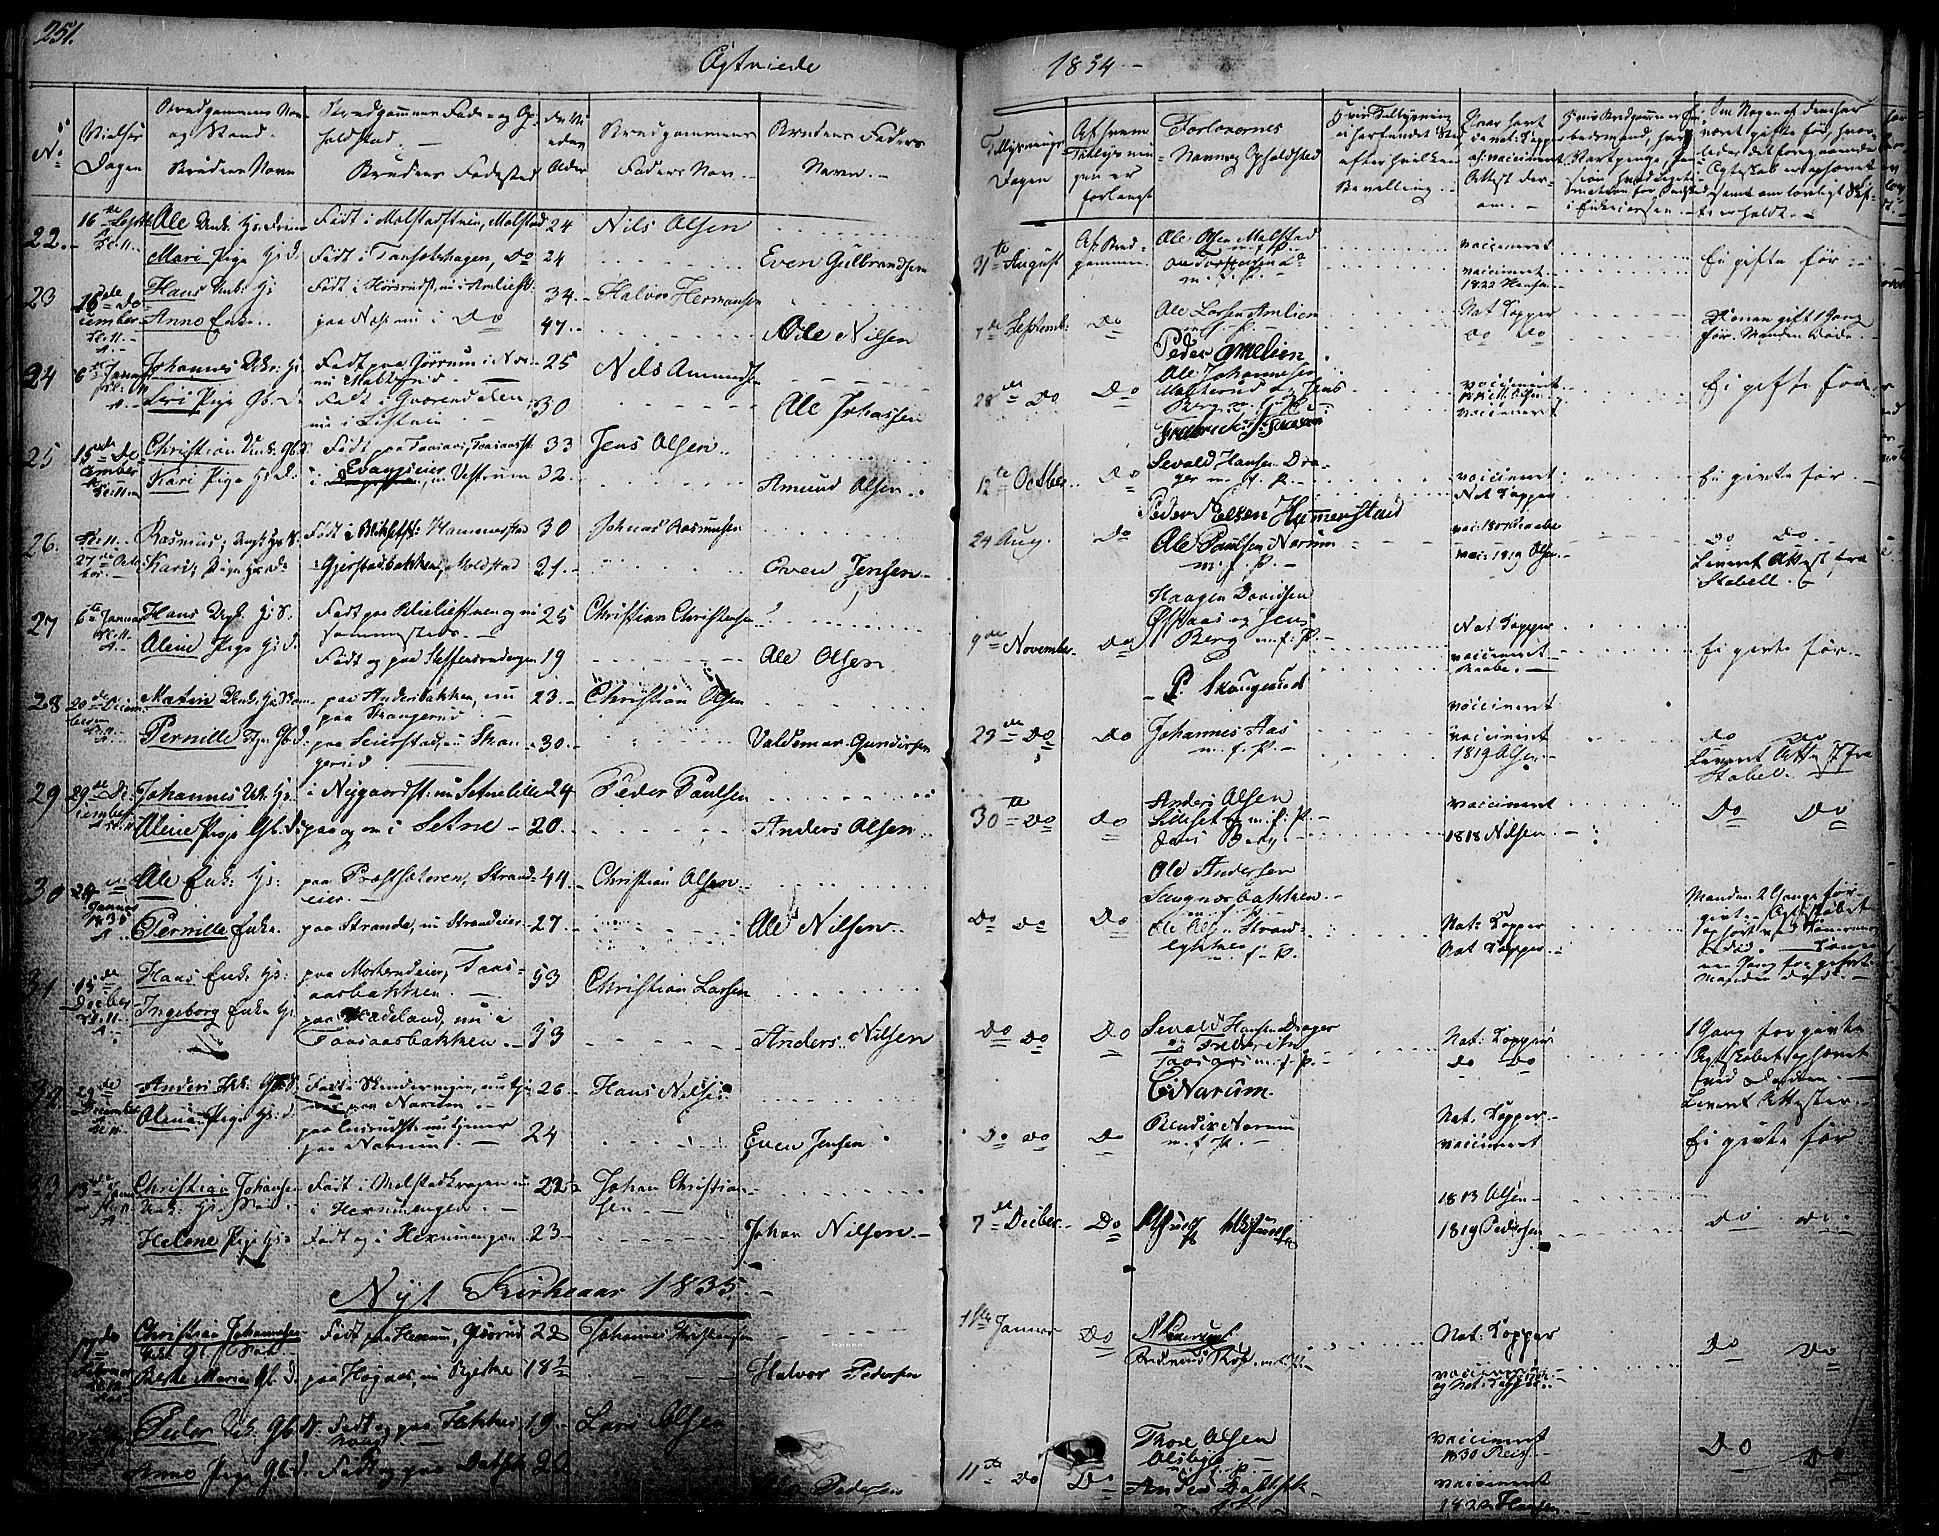 SAH, Vestre Toten prestekontor, H/Ha/Haa/L0002: Ministerialbok nr. 2, 1825-1837, s. 251